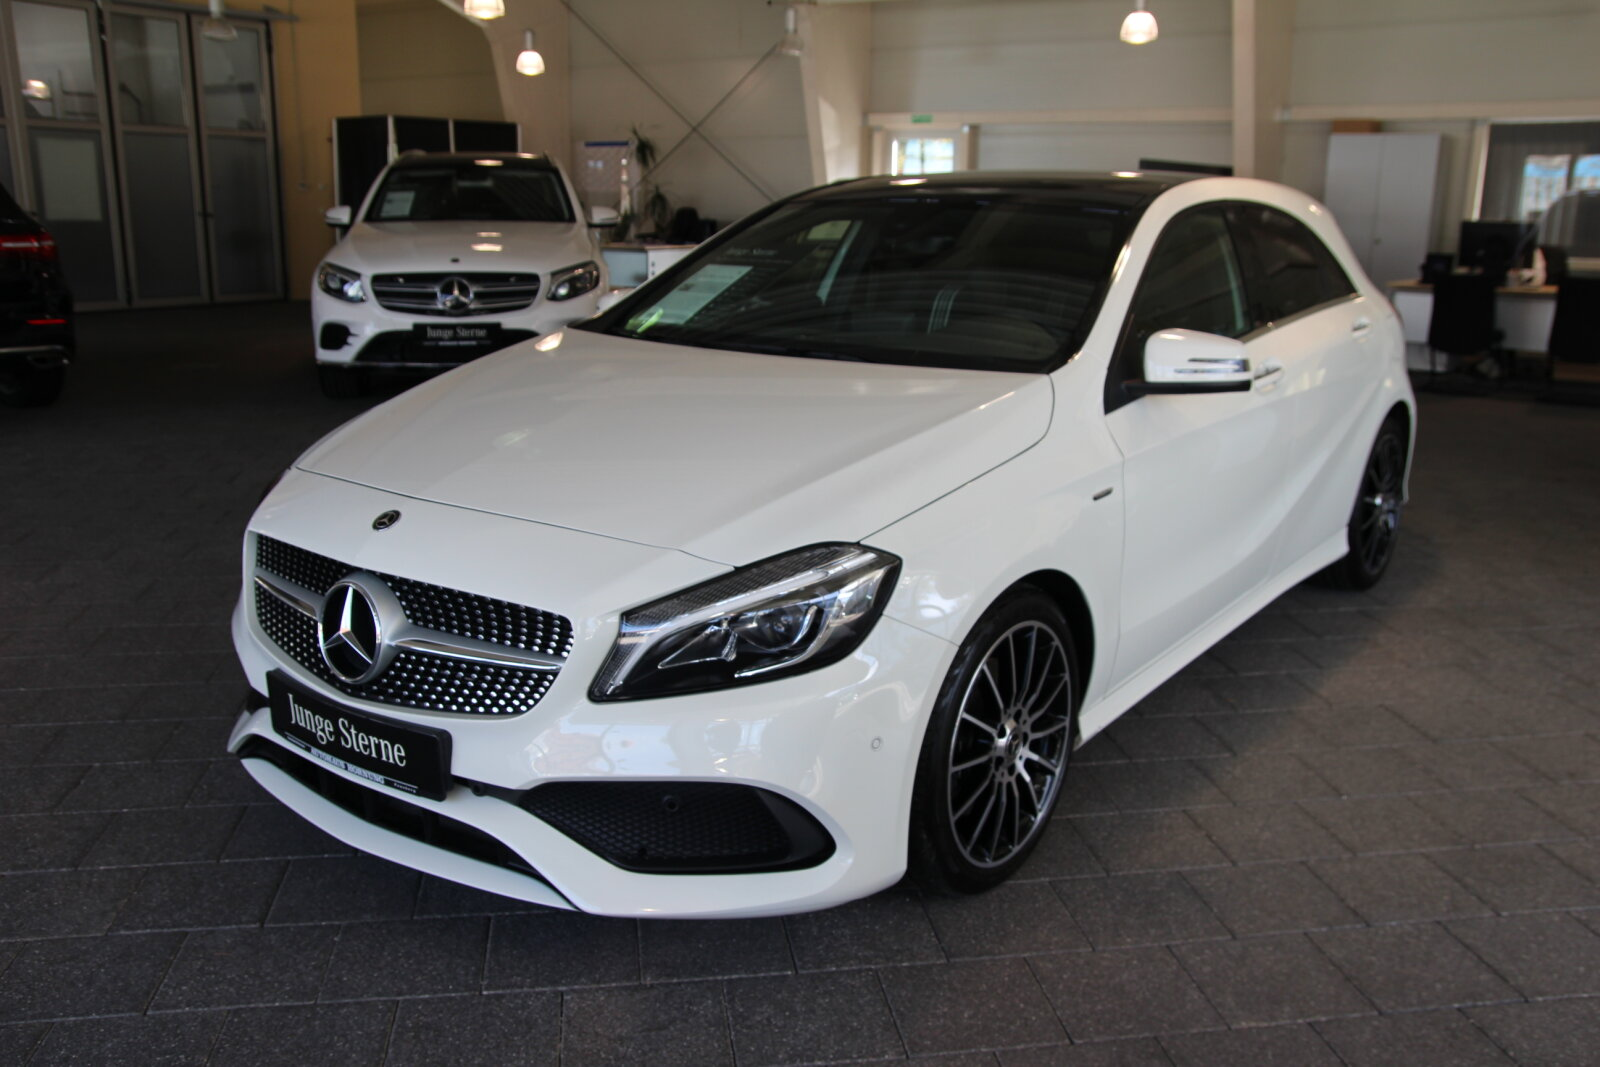 Mercedes-Benz A 220 d 4M AMG Line/Pano/LED/Kamera/Ambiente, Jahr 2017, Diesel